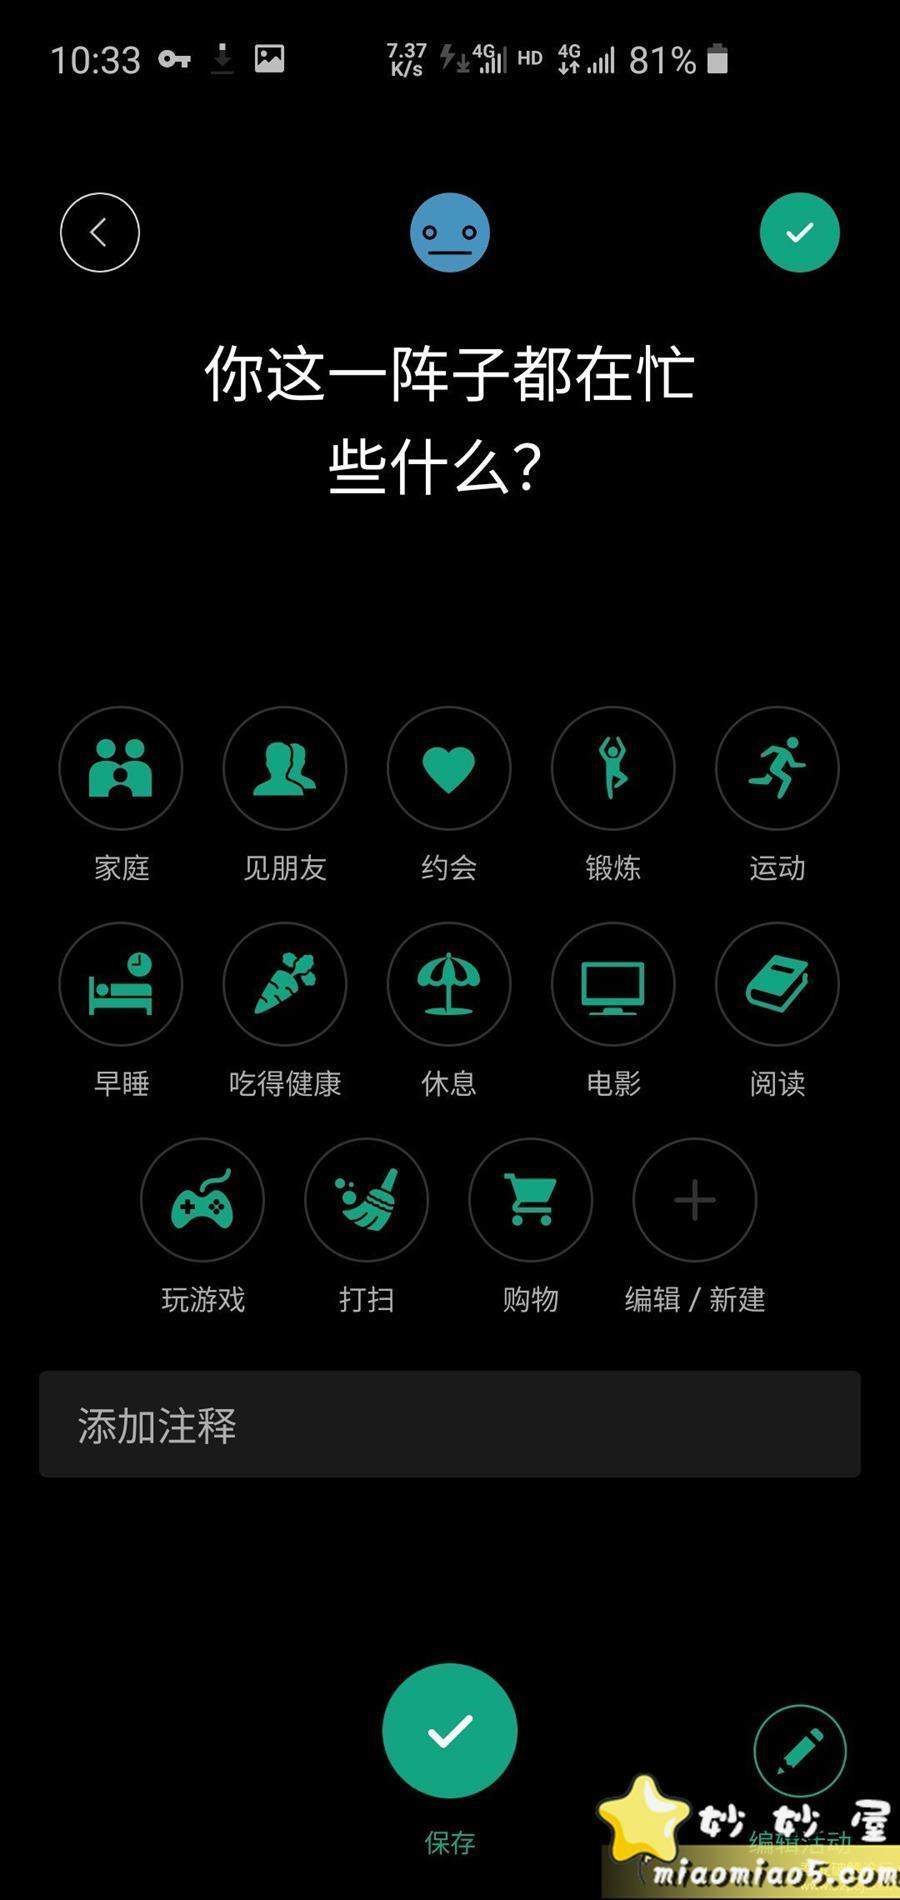 [Android]超懒人级的日记 Daylio Play商店版 v1.30.1图片 No.2